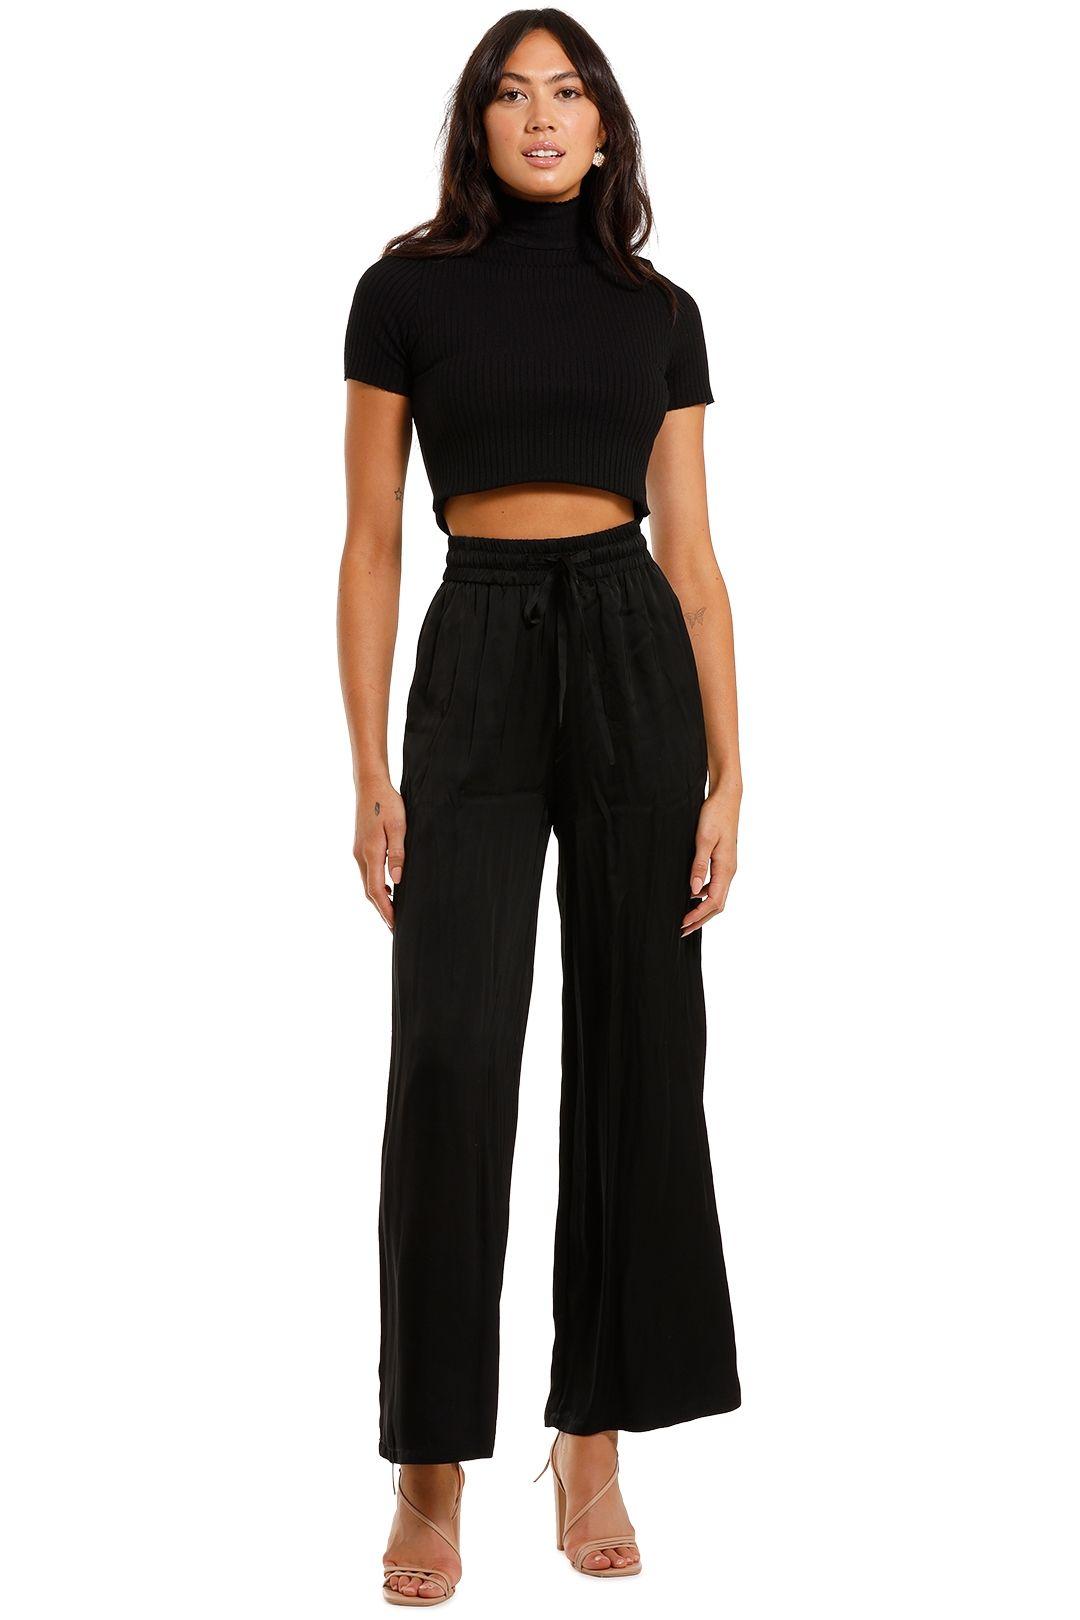 Jillian Boustred Black Lounge Trouser high waist